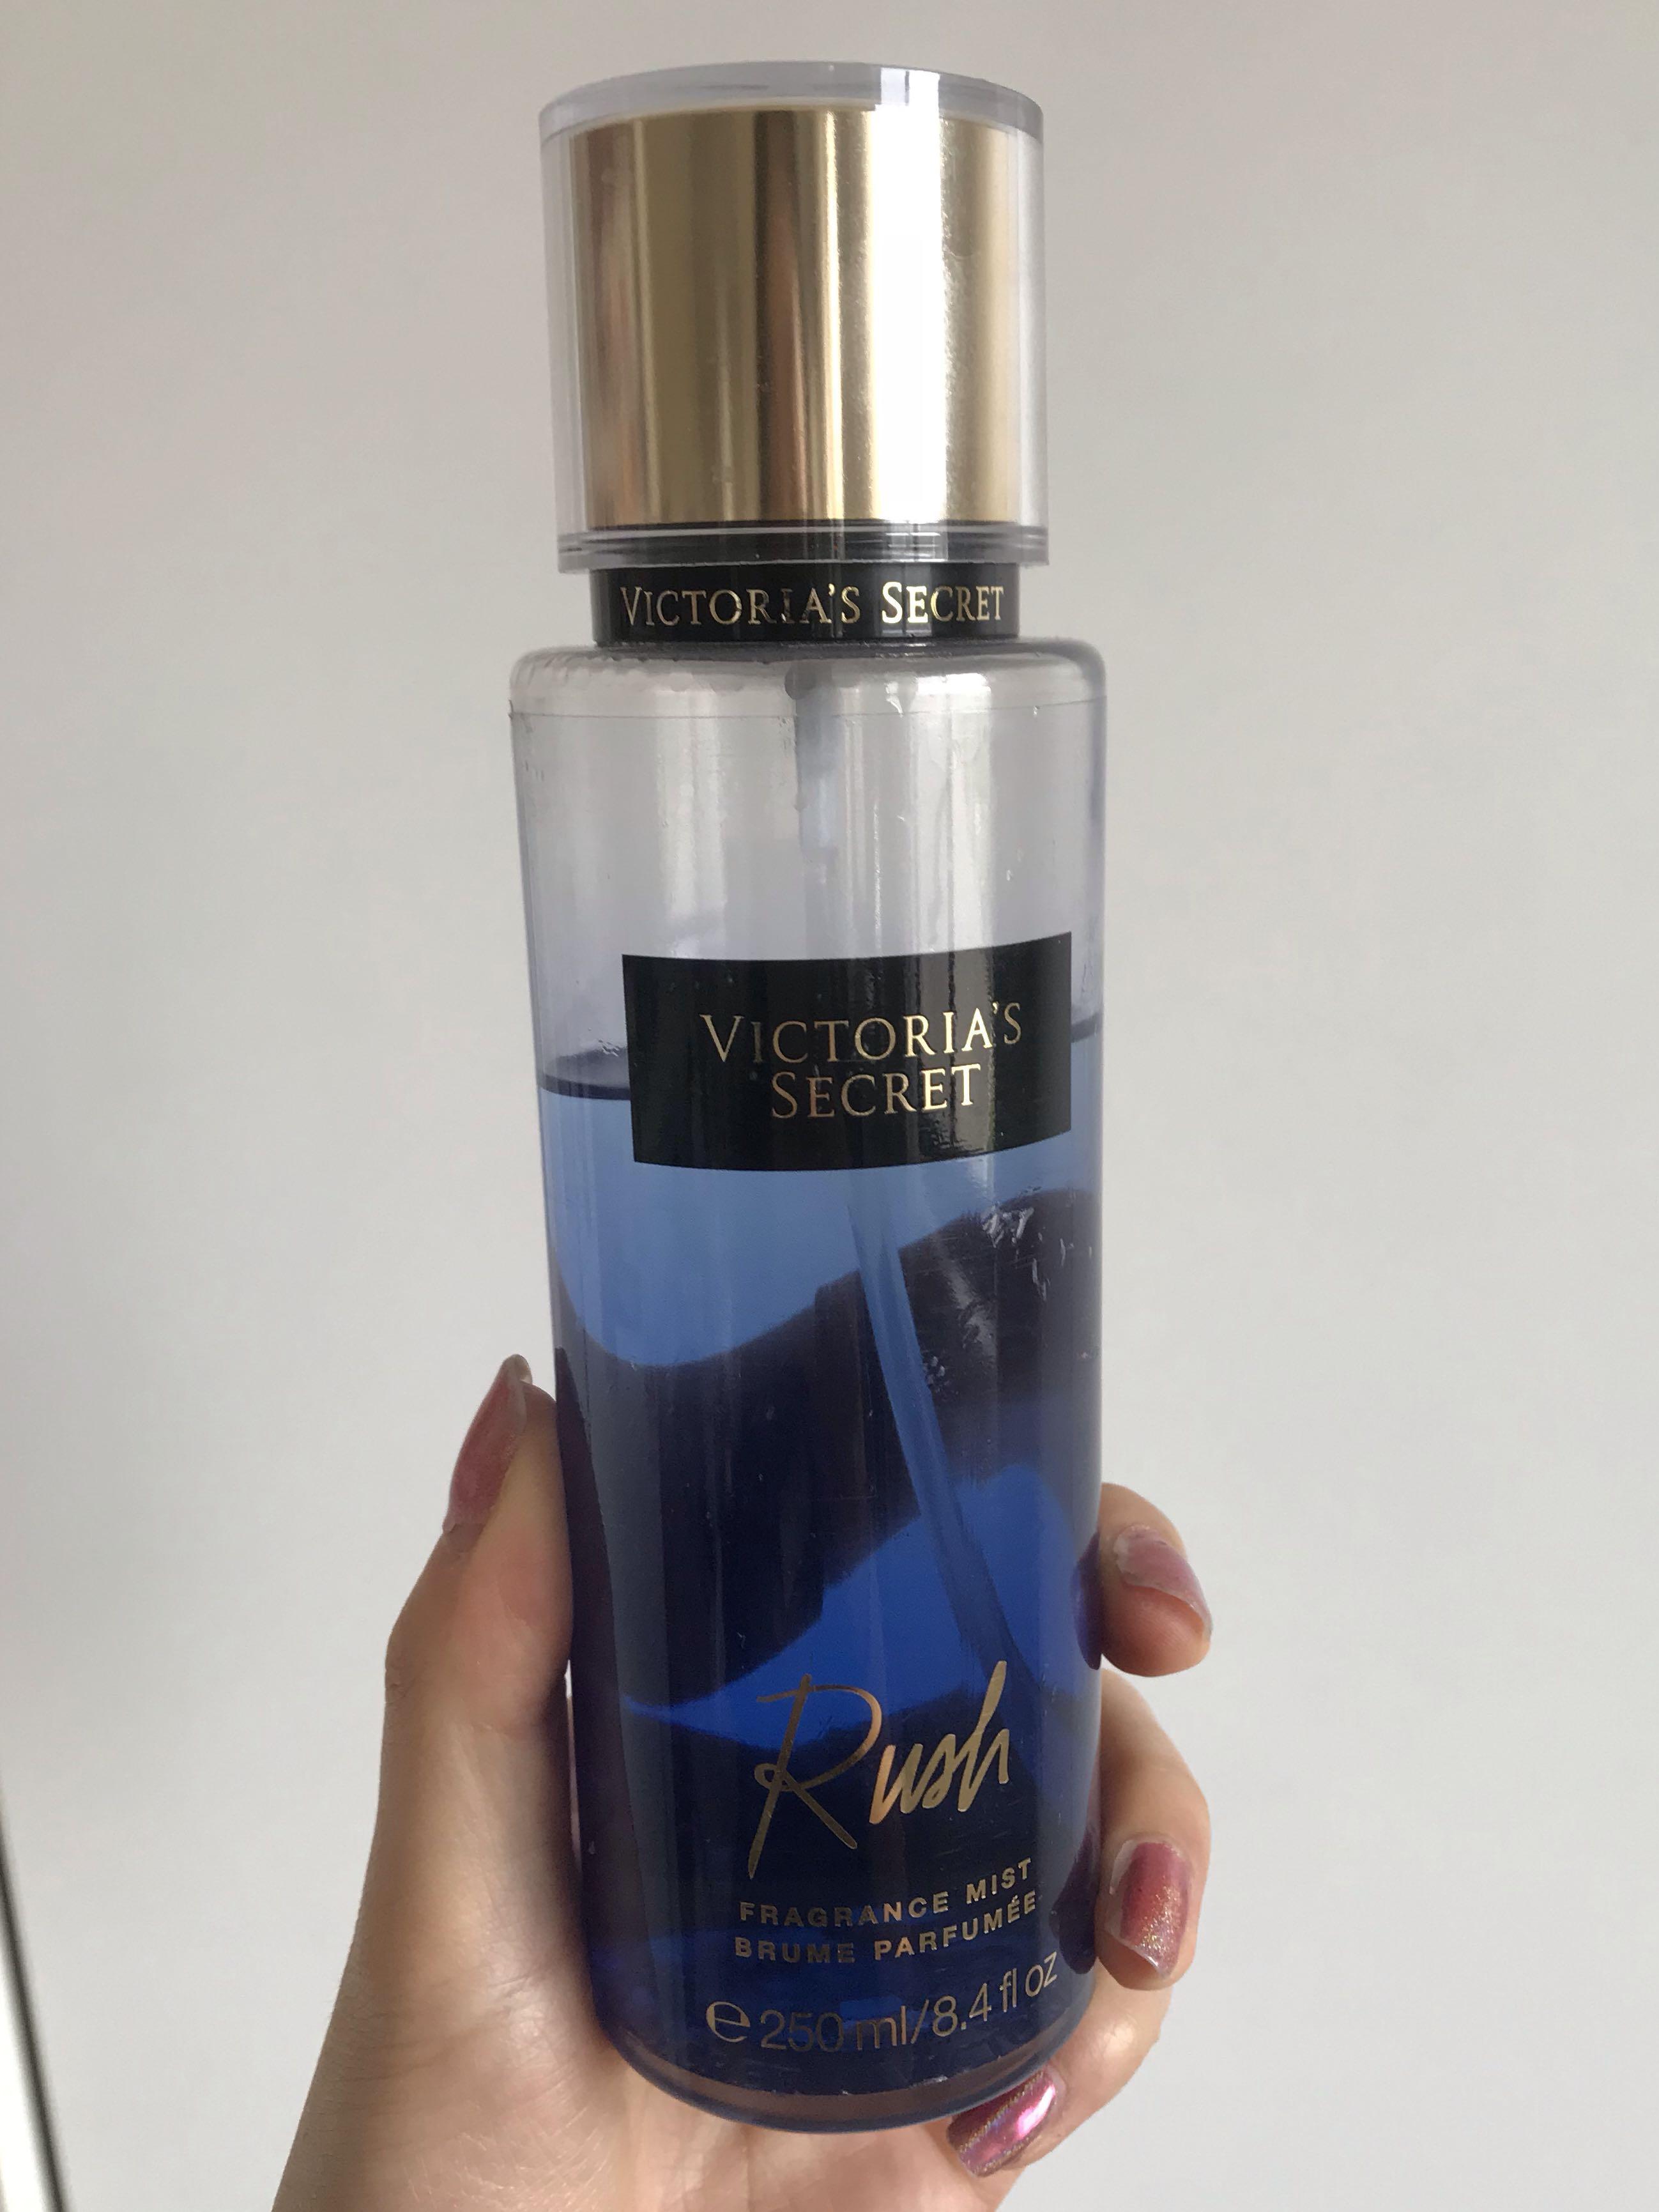 Victoria's Secret Rush body spray fragrance mist 250mL